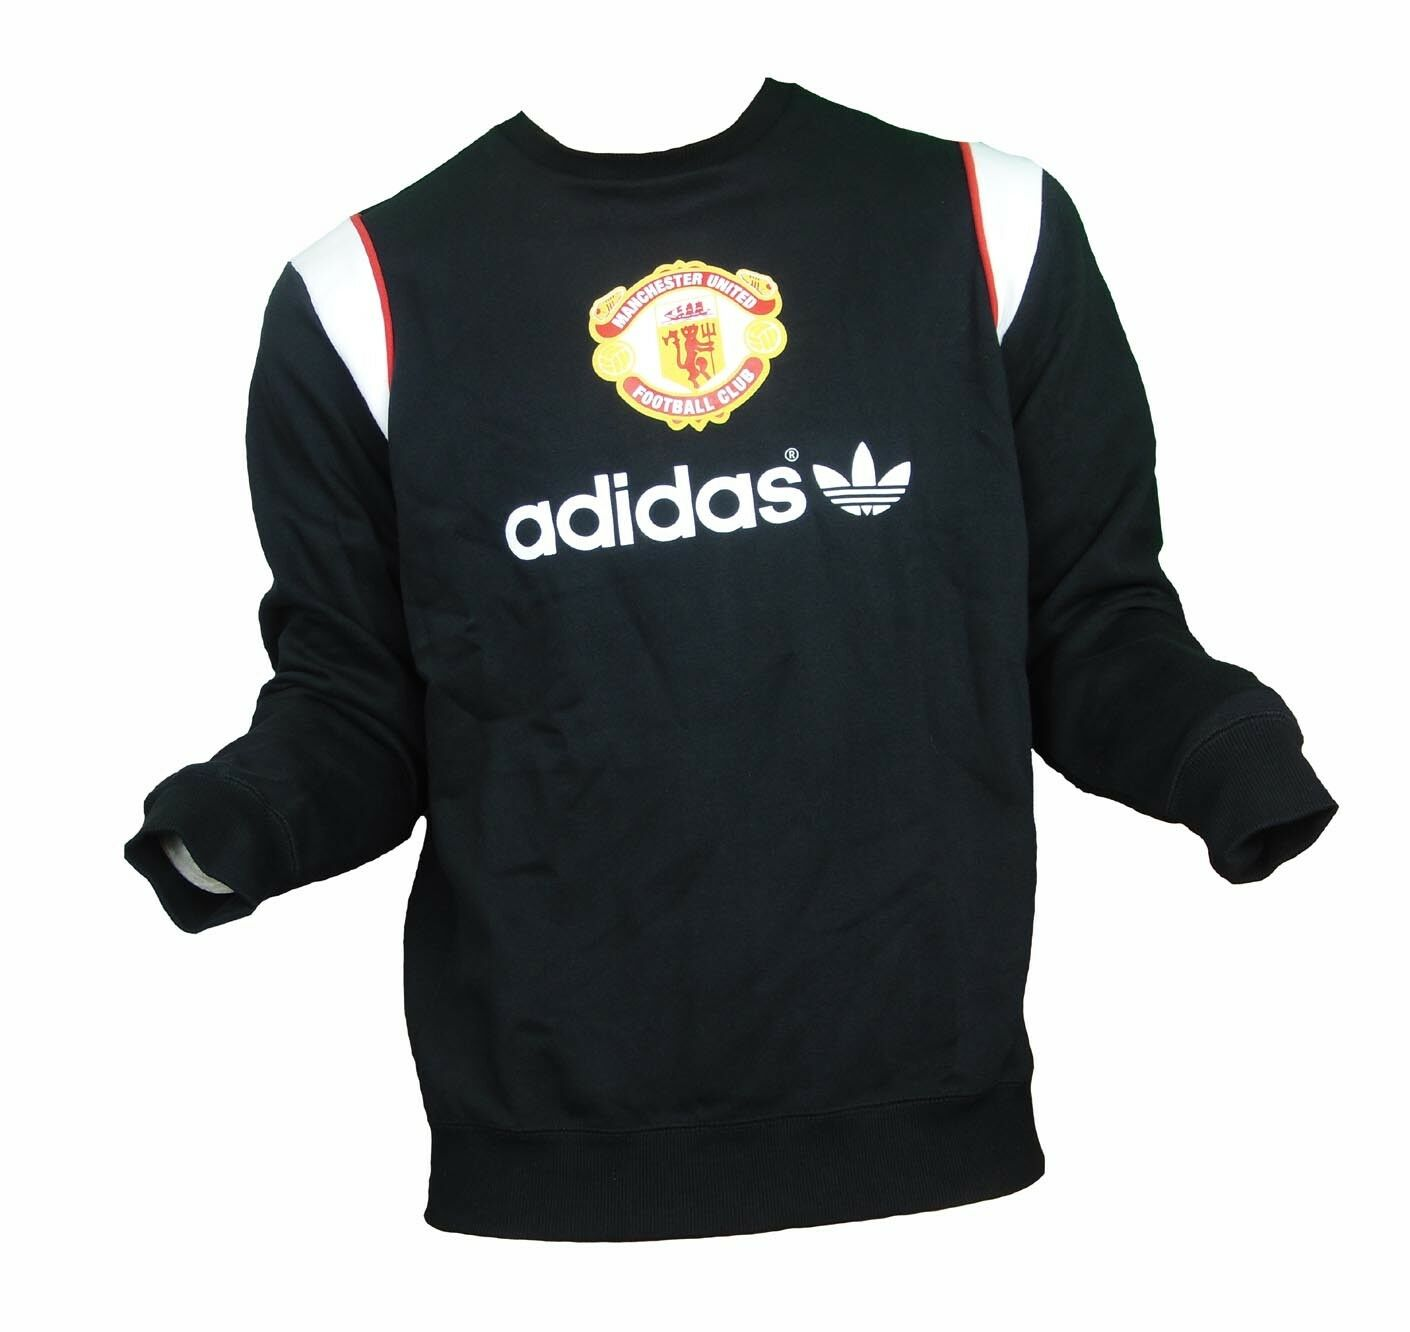 Manchester United Sweatshirt Trainingstop Adidas Retro Retro Retro 2015 XS S M  | Stil  9d4489